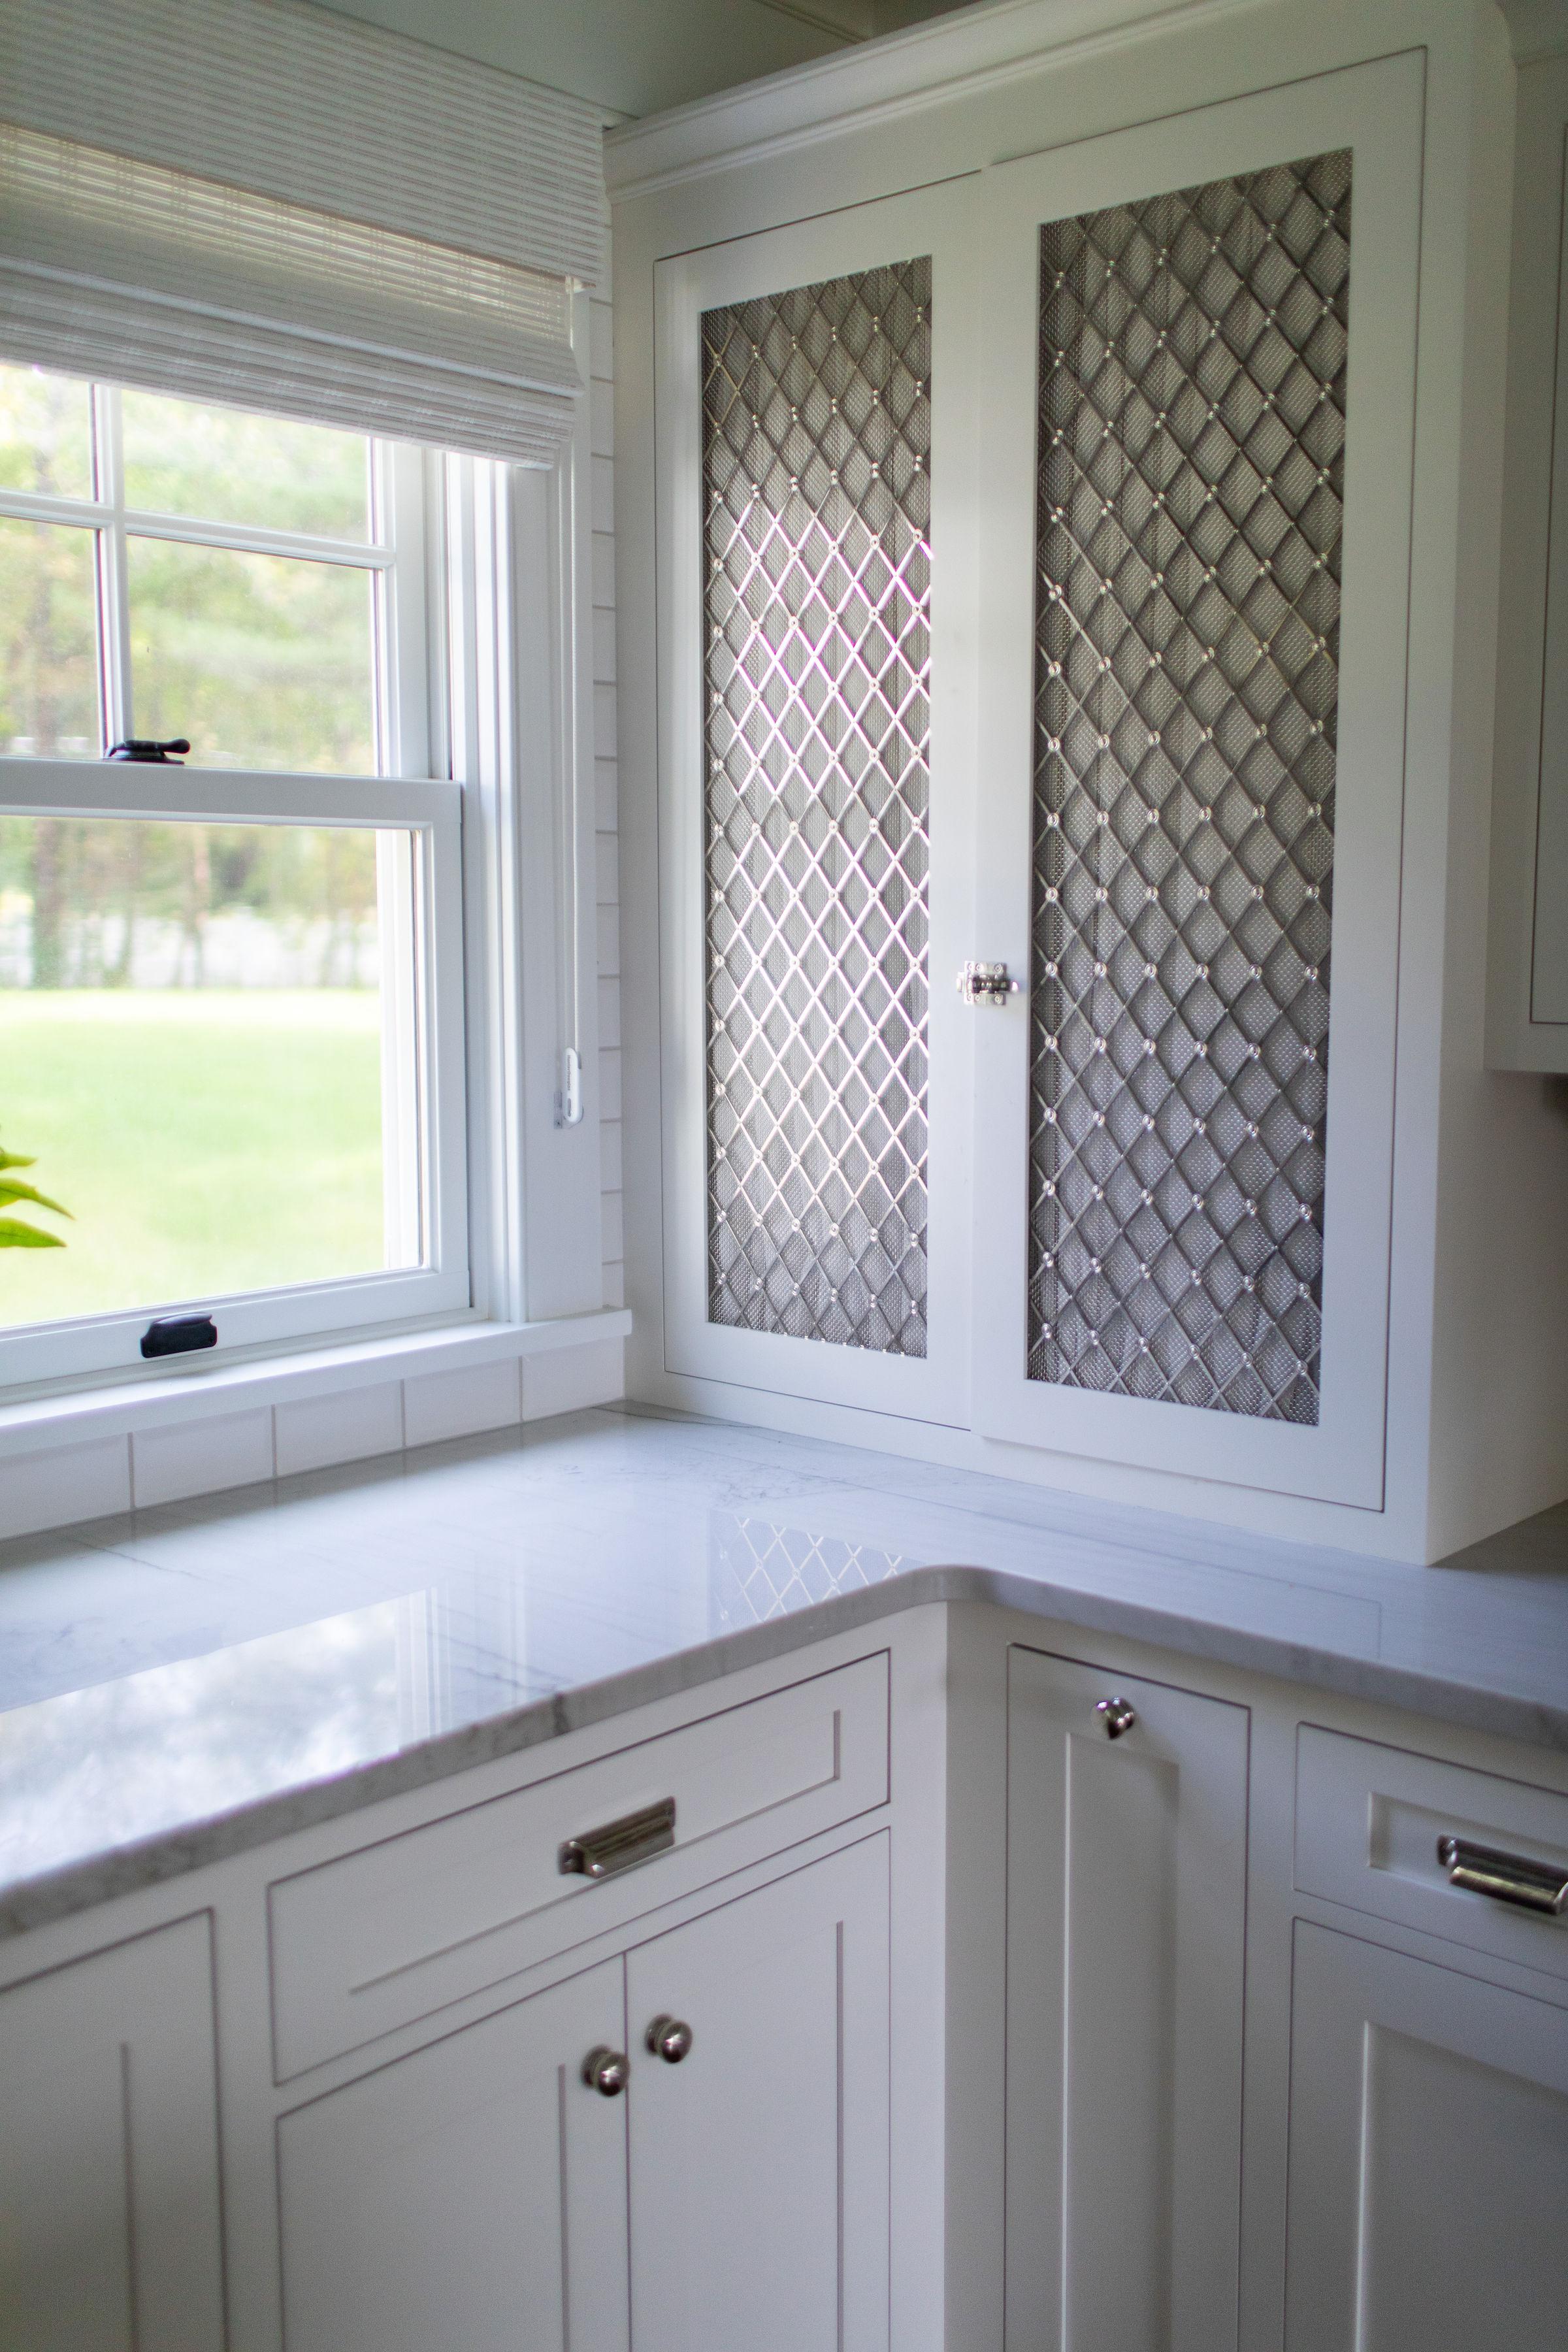 Cottage interior design style, Teaselwood Design, New York interior designer